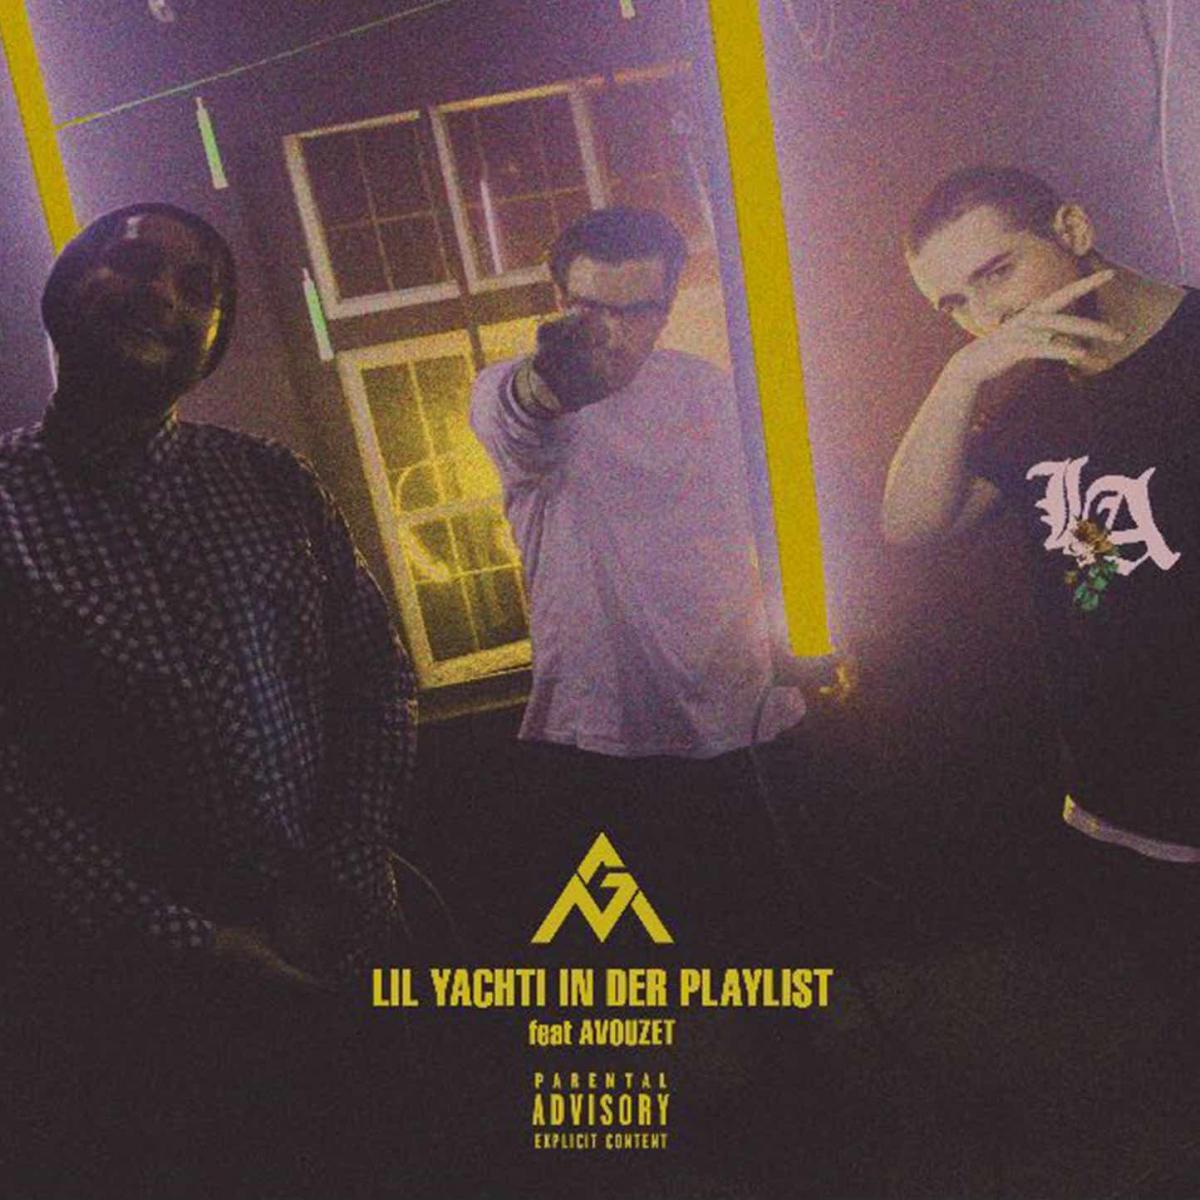 Upcoming: GalliasxMacklin - Lil Yachti In Der Playlist